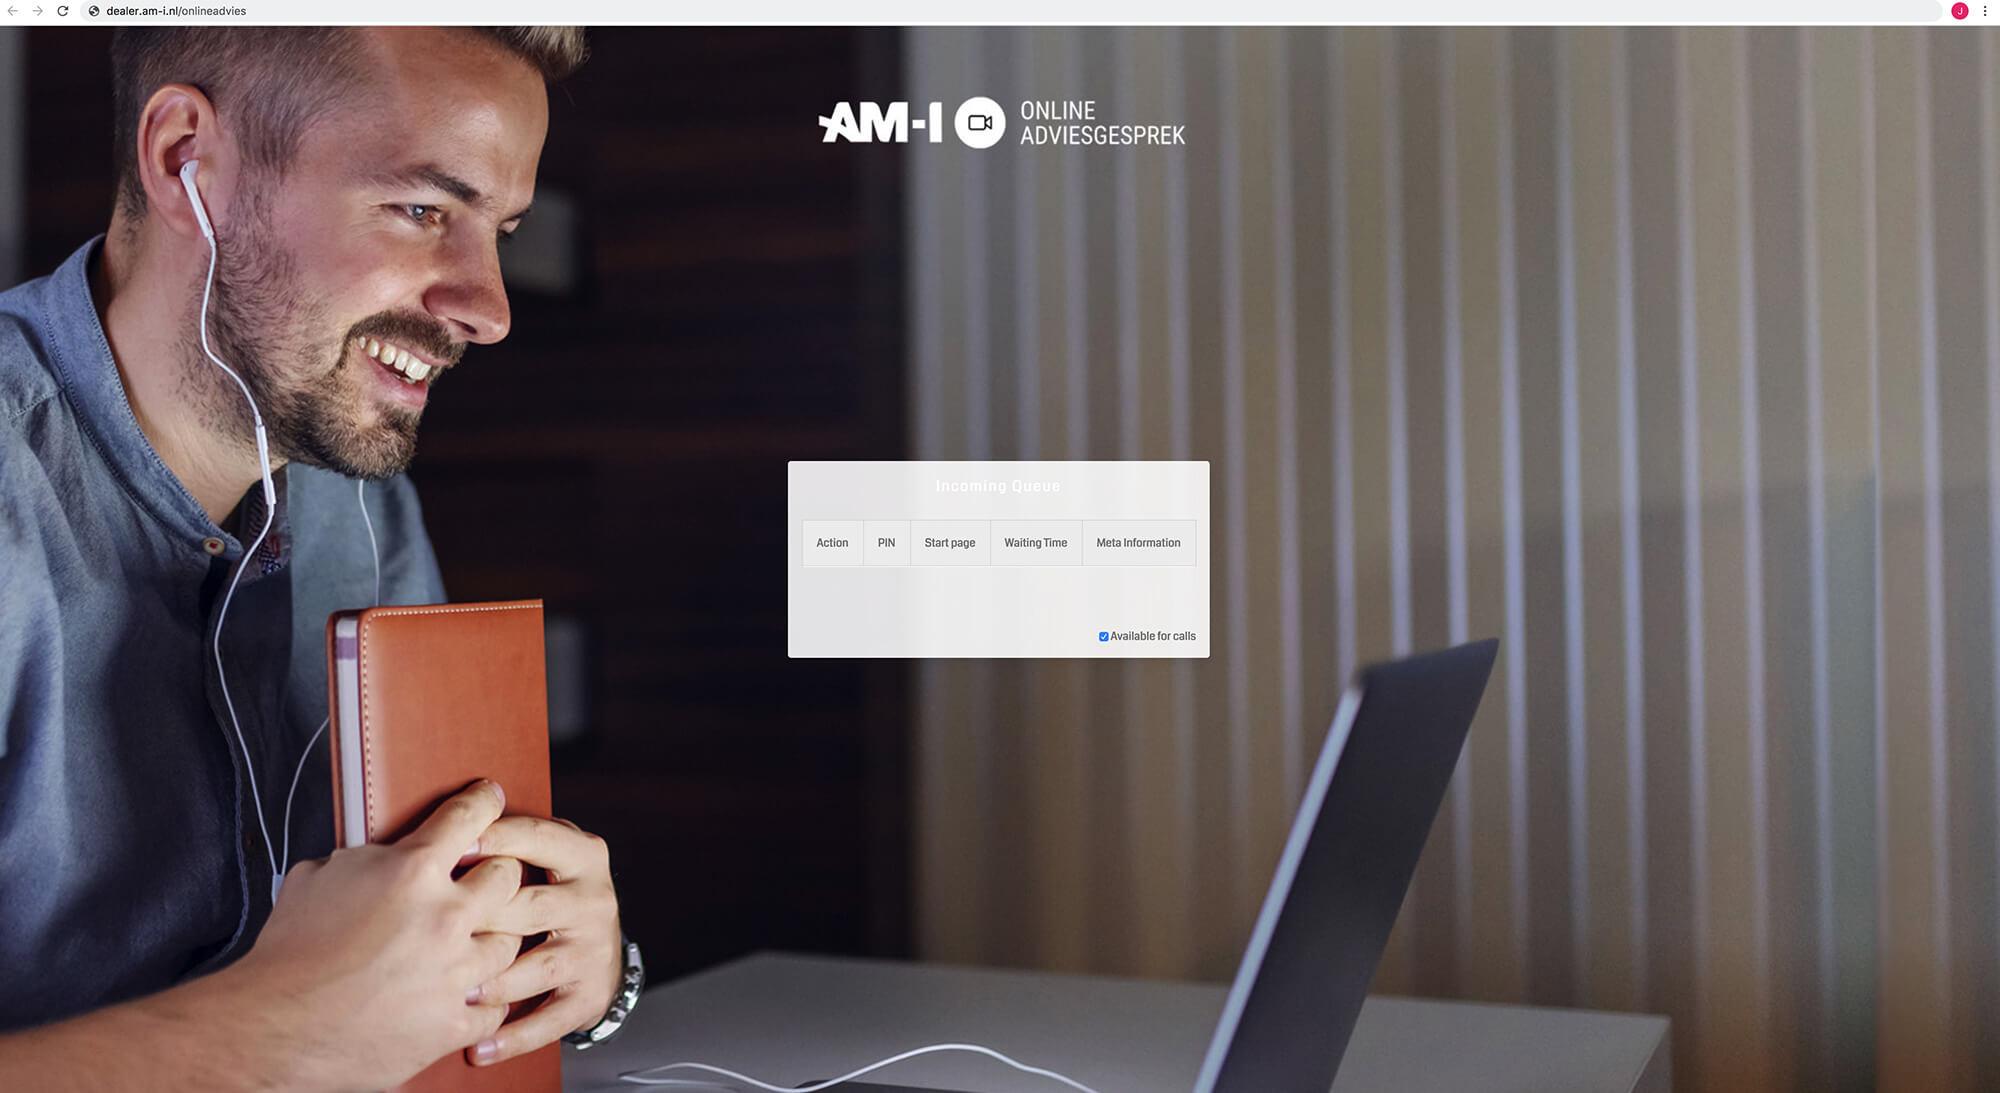 AM-i Online Consultation